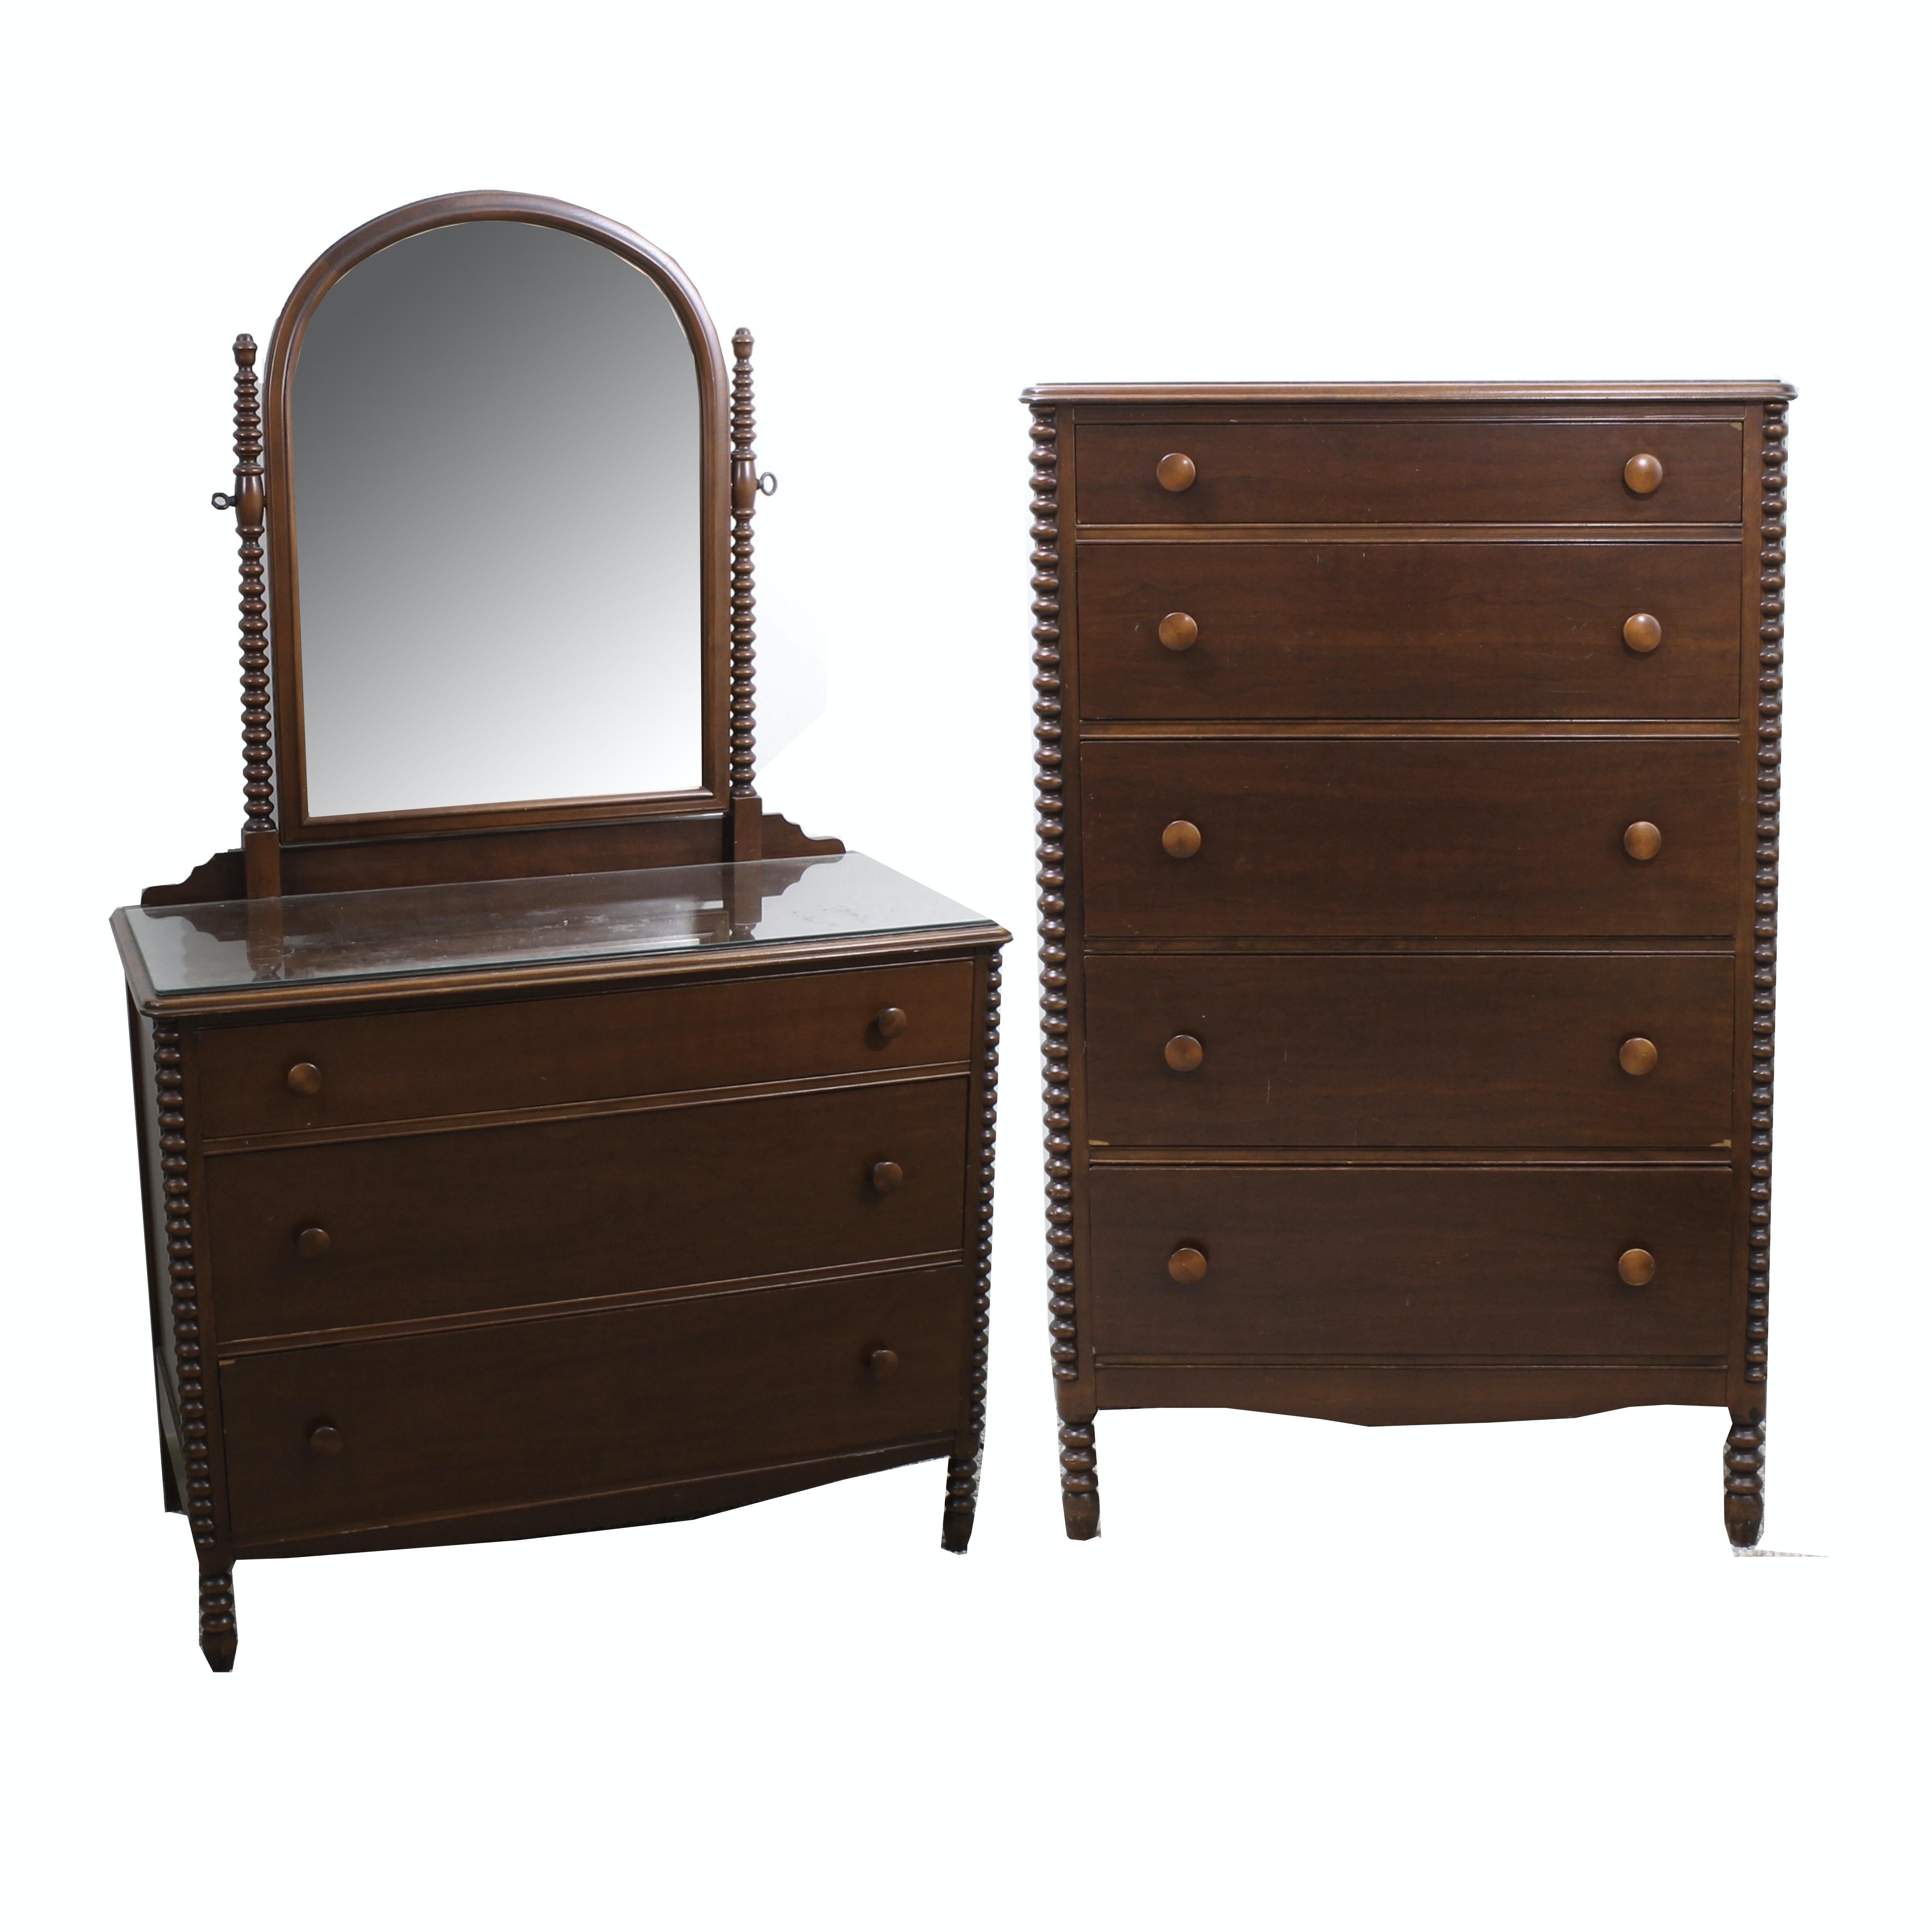 Vintage Wheeler-Okell Co. Cherry Veneer Chest and Dresser with Mirror